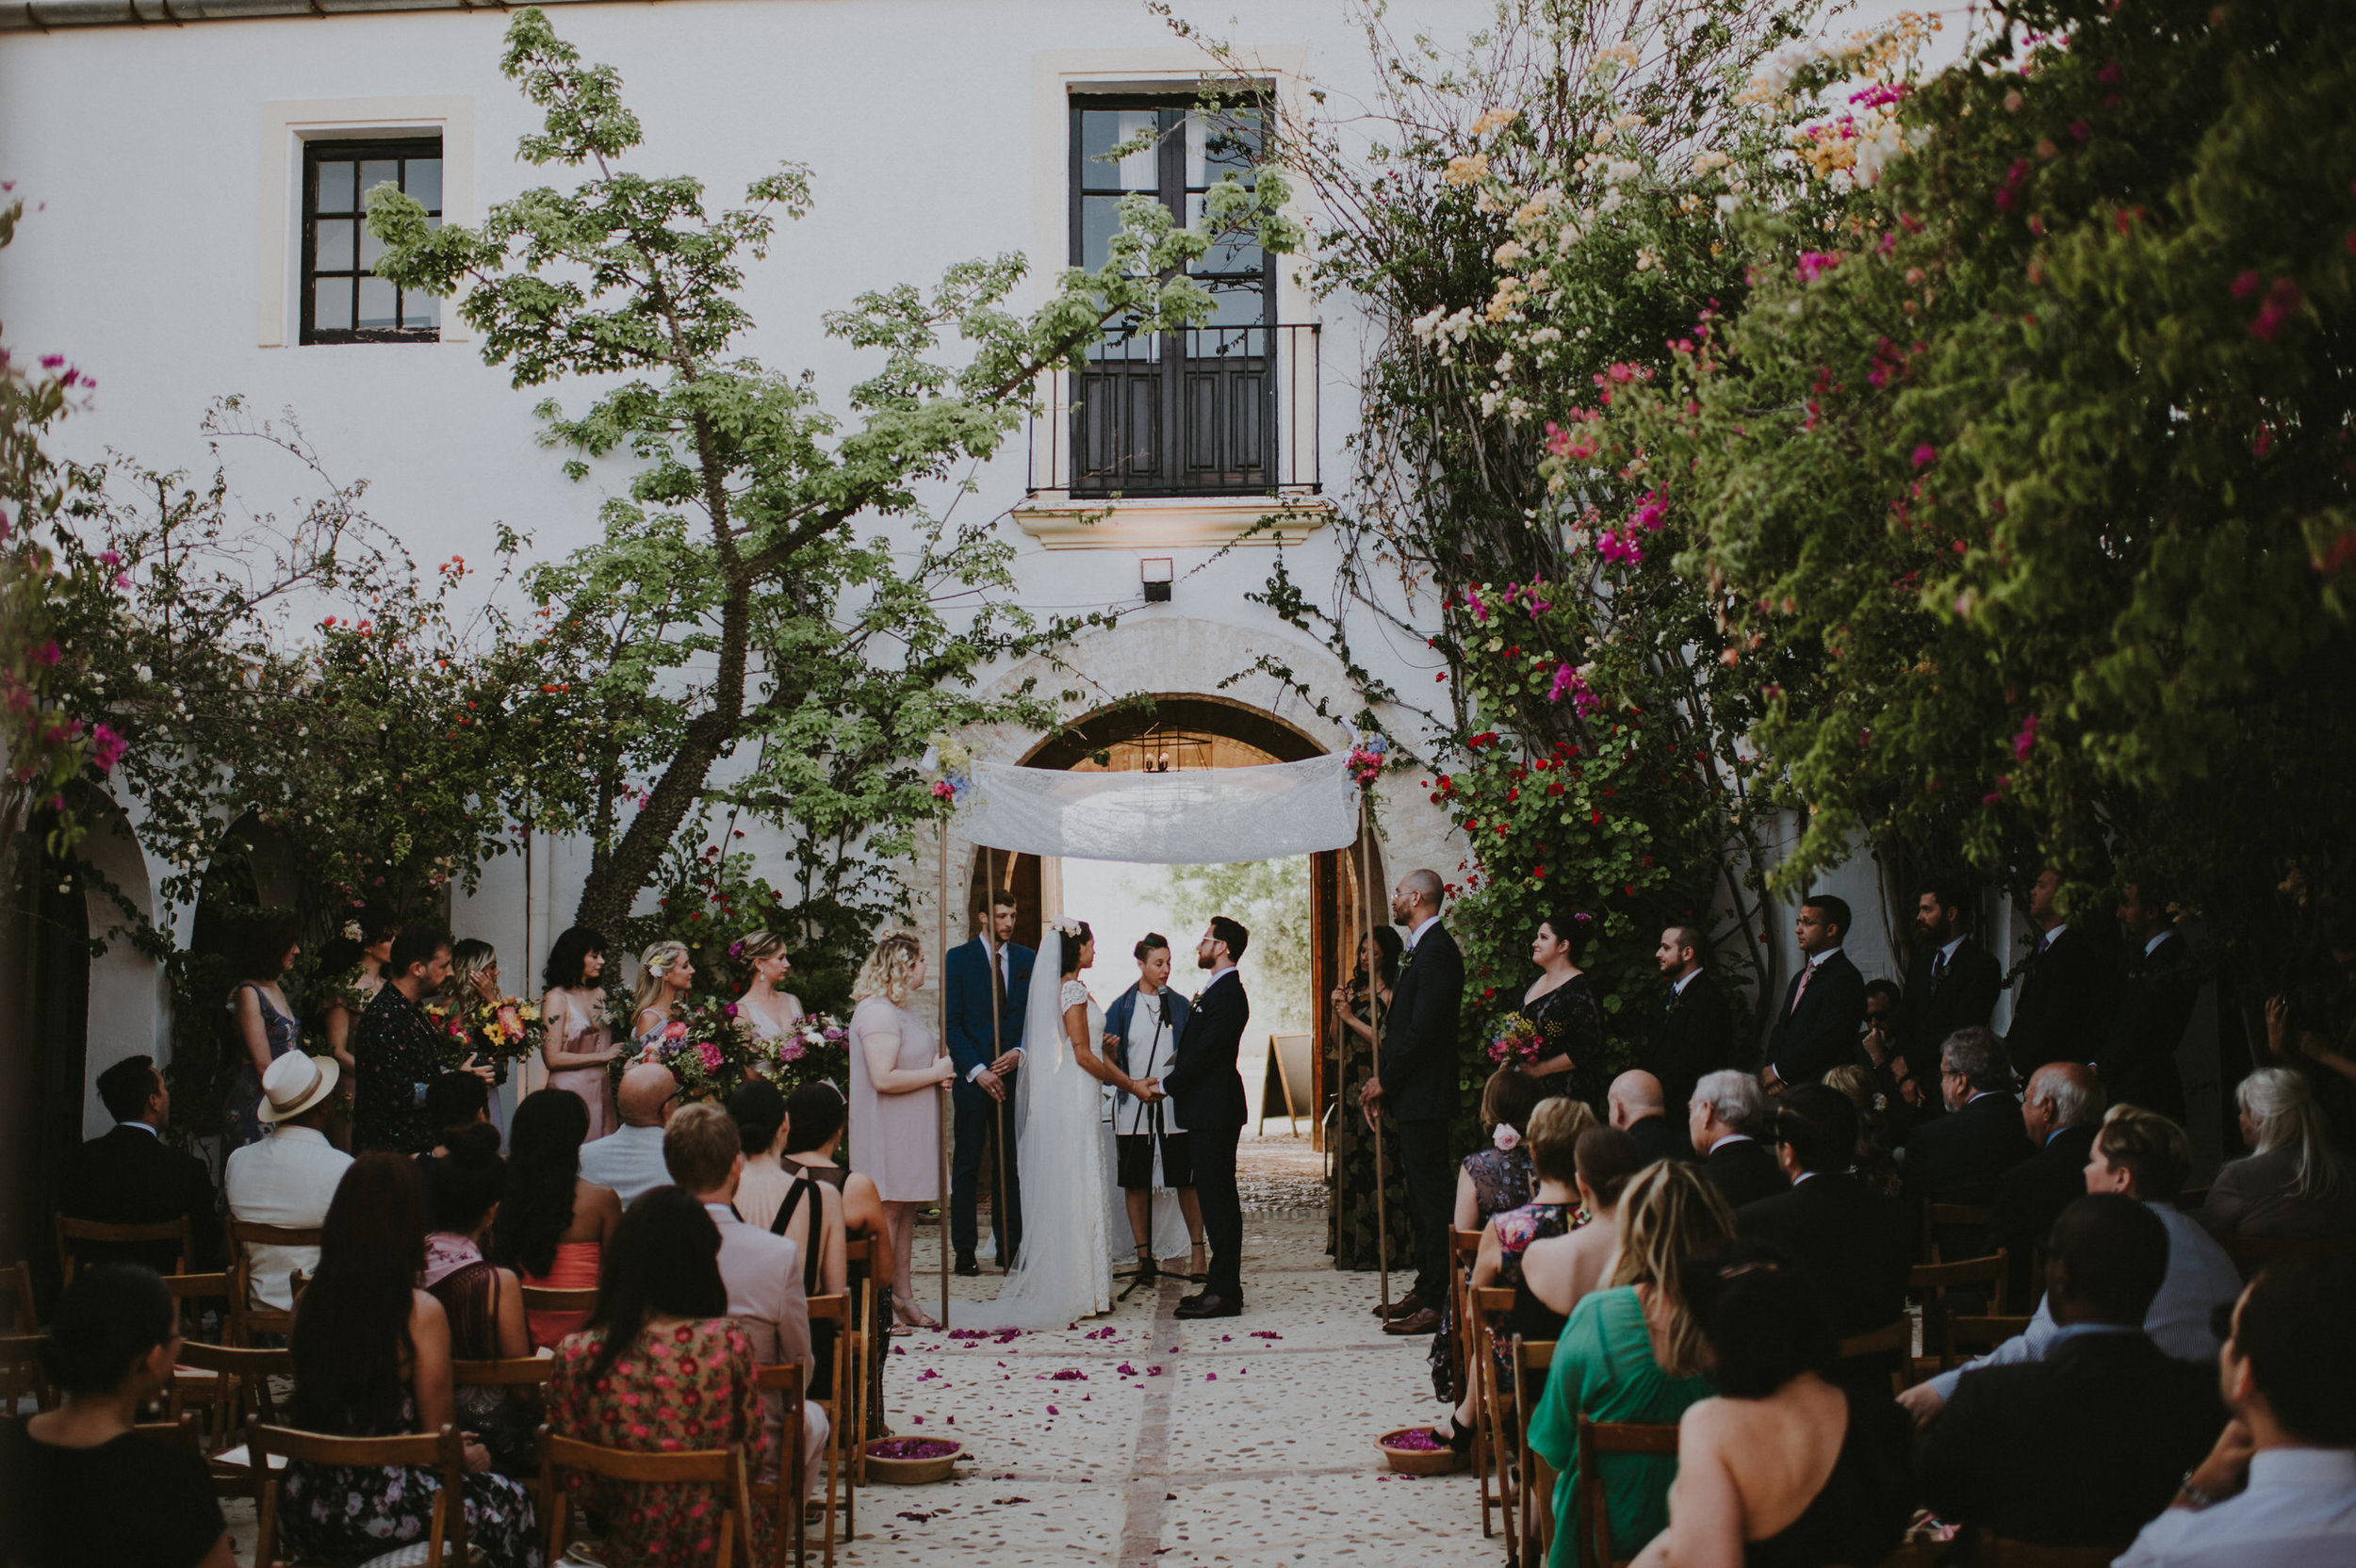 Andres+Amarillo+fotografo+boda+sevilla+natural+sin+poses+hacienda+san+rafael (60).JPG